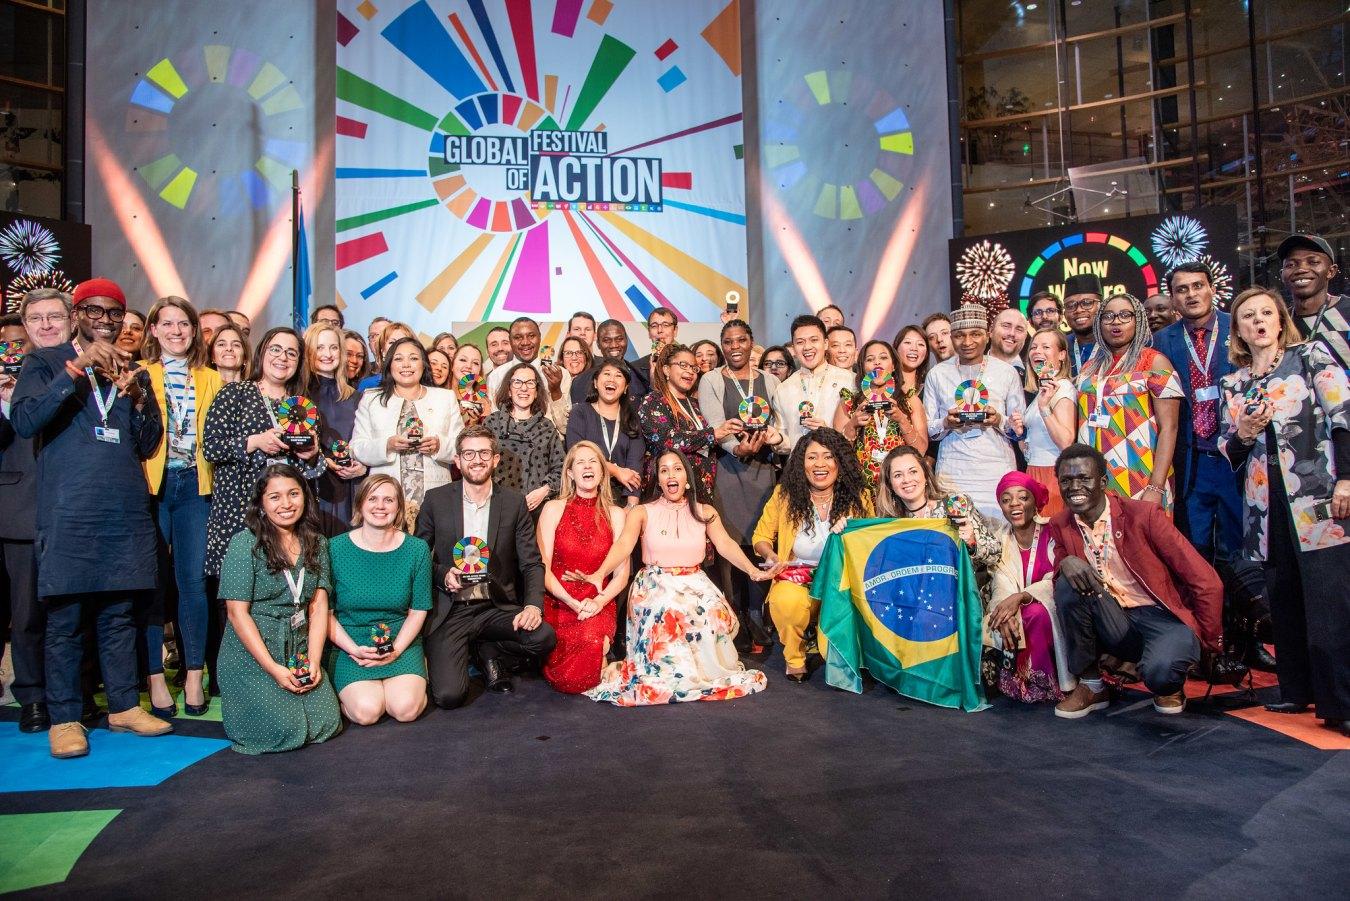 Meet the 8 Winners of the UN SDG Action Awards 2019